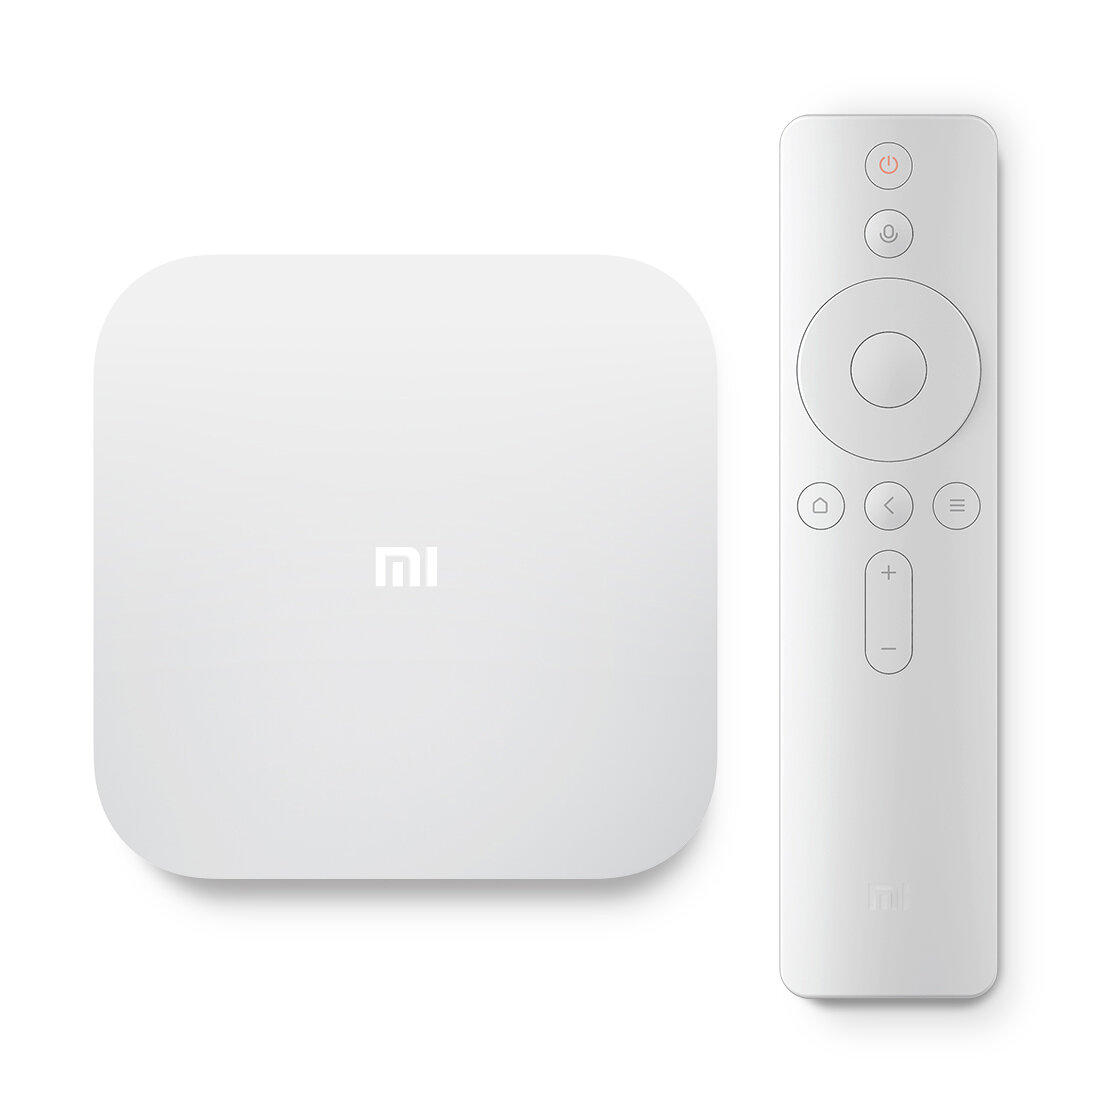 XIAOMI Mi Box 4S Amlogic RAM 2GB ROM 8GB 5G Wifi bluetooth 4.2 Android 6.0 4K HDR UHD TV Box Support DOLBY Audio DTS 2.0 H.265 4K@60fps